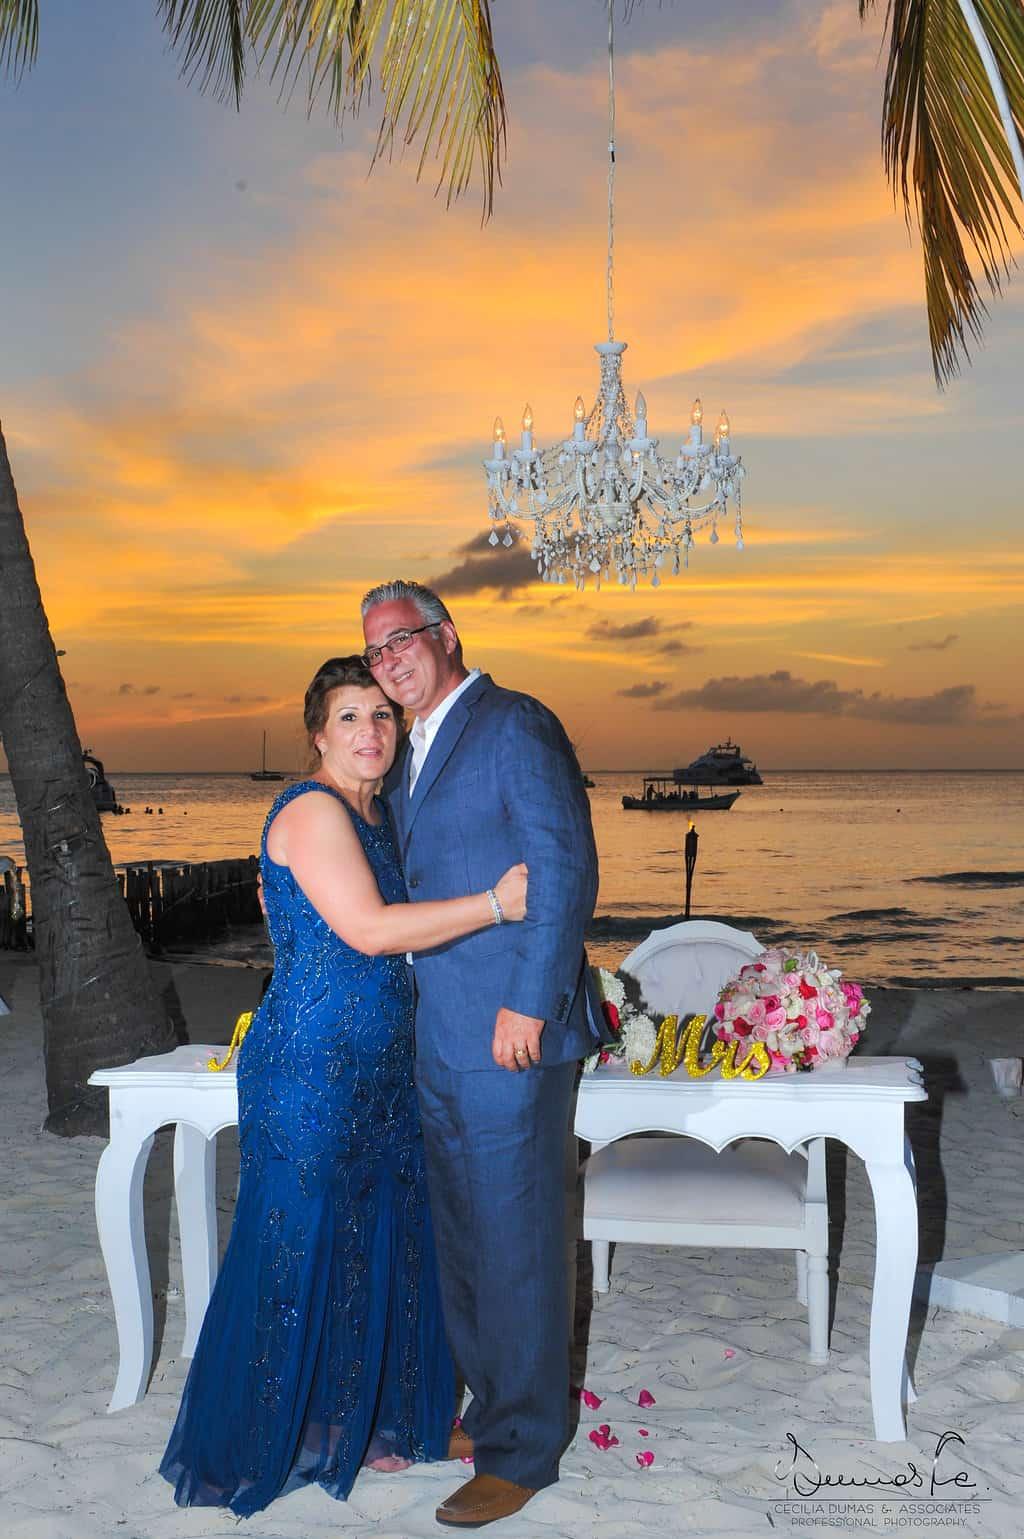 islamujeres-buhos-weddingphotography-giovannarosario87